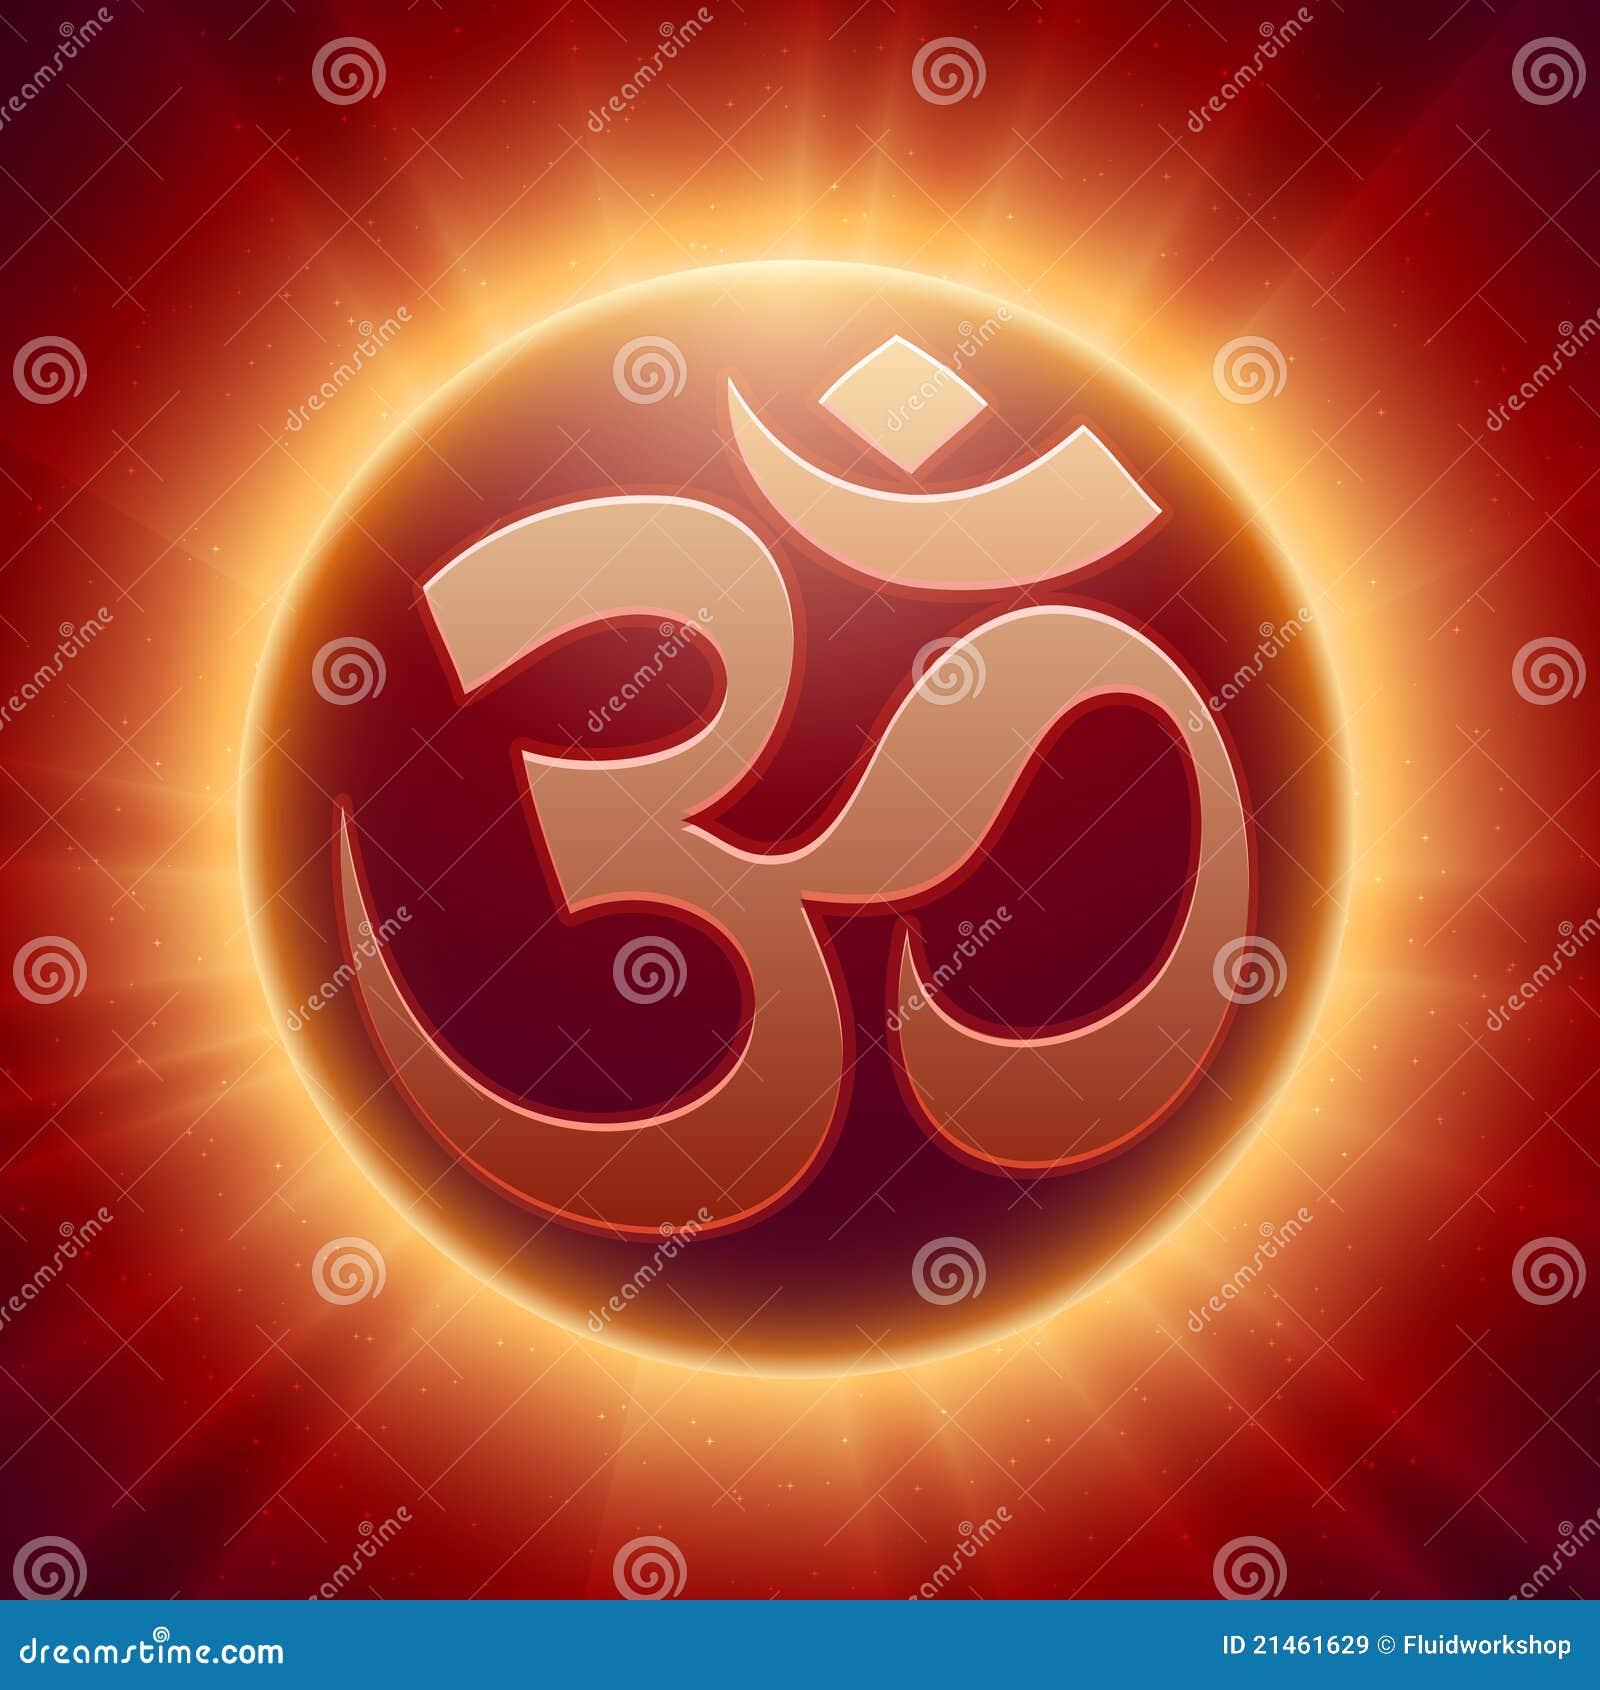 Karma symbol hindu image collections symbol and sign ideas vector hindu om symbol stock vector illustration of karma 21461629 vector hindu om symbol buycottarizona biocorpaavc